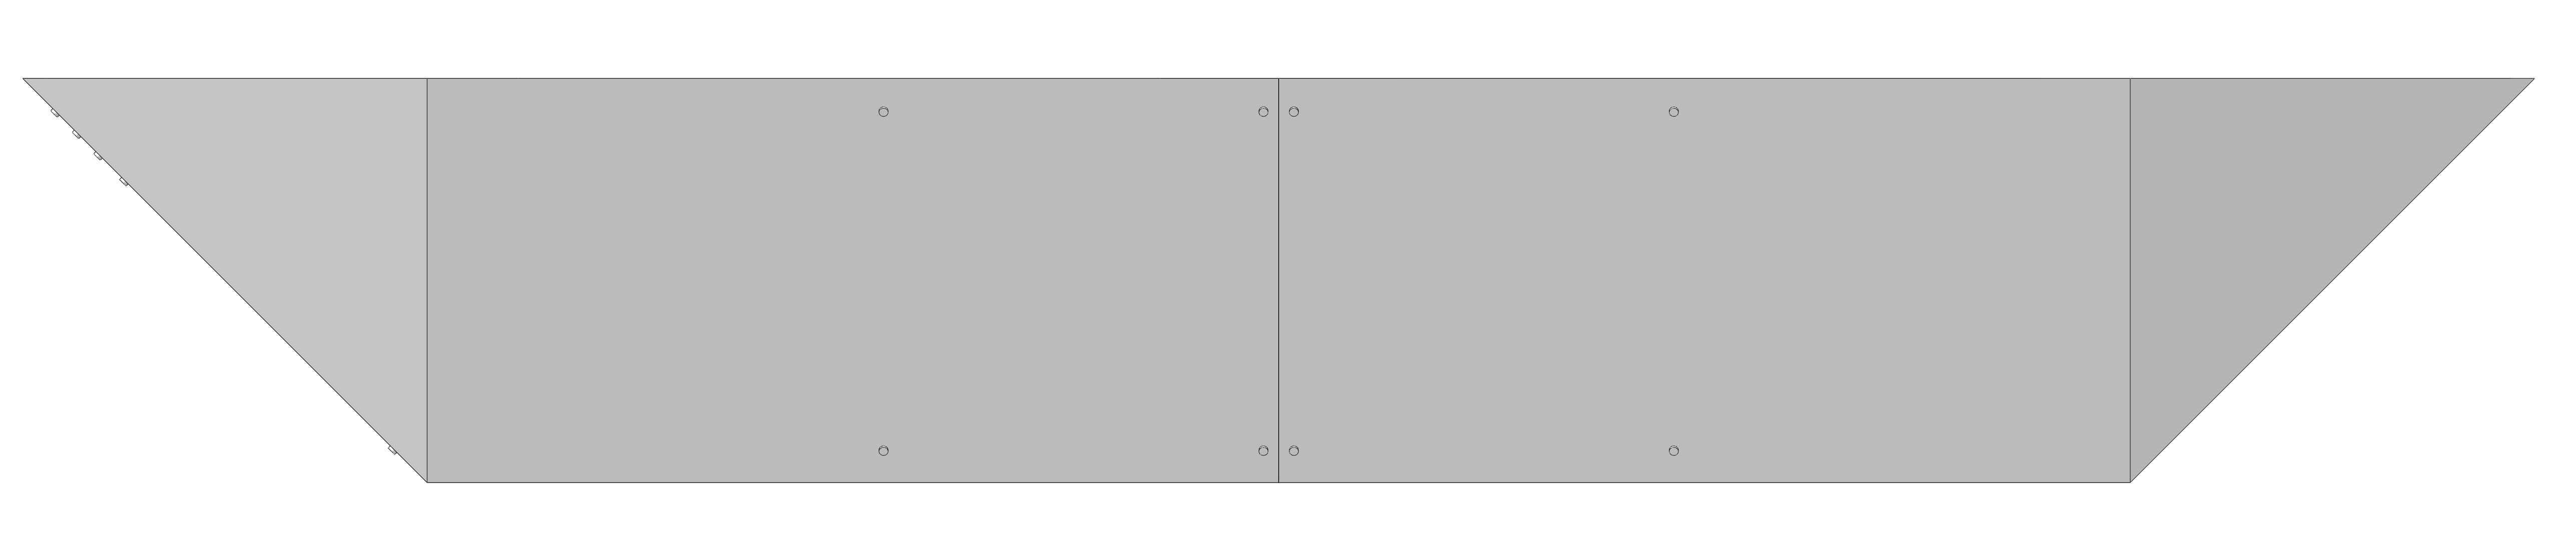 Module 2 Bottom Sub-Assembly_001.JPG